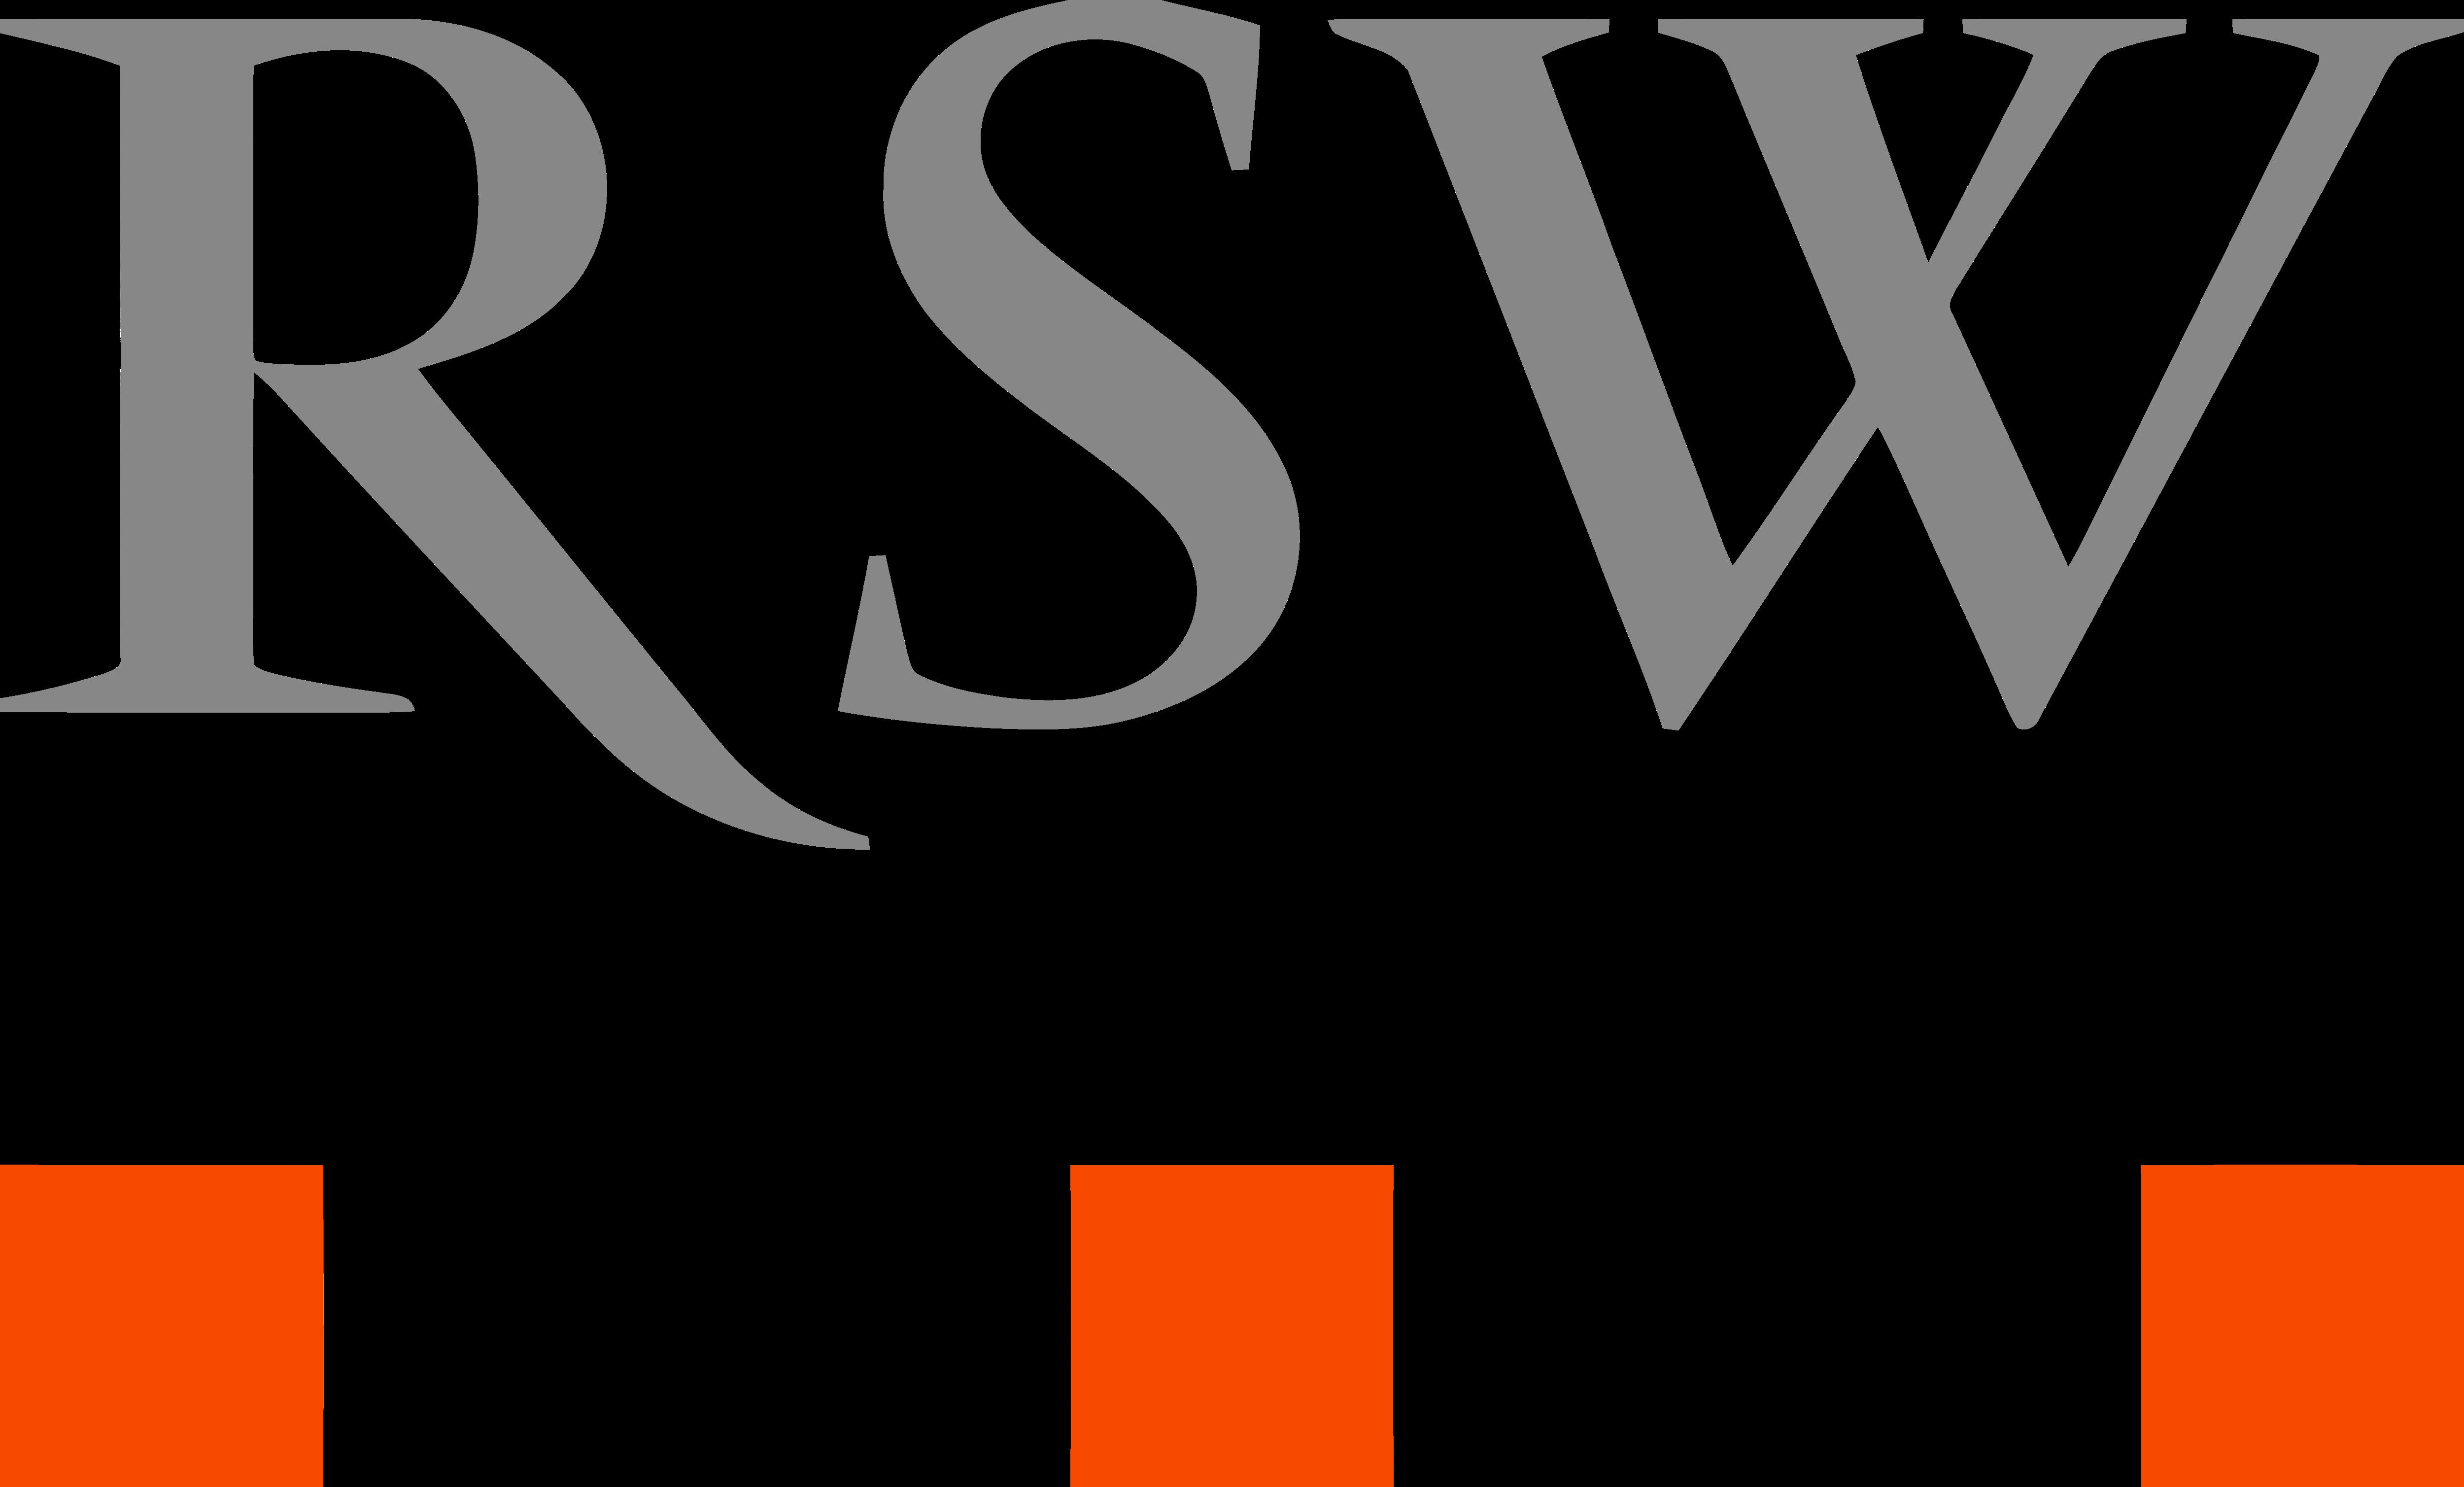 Rama Swiss Watch – Logos Download